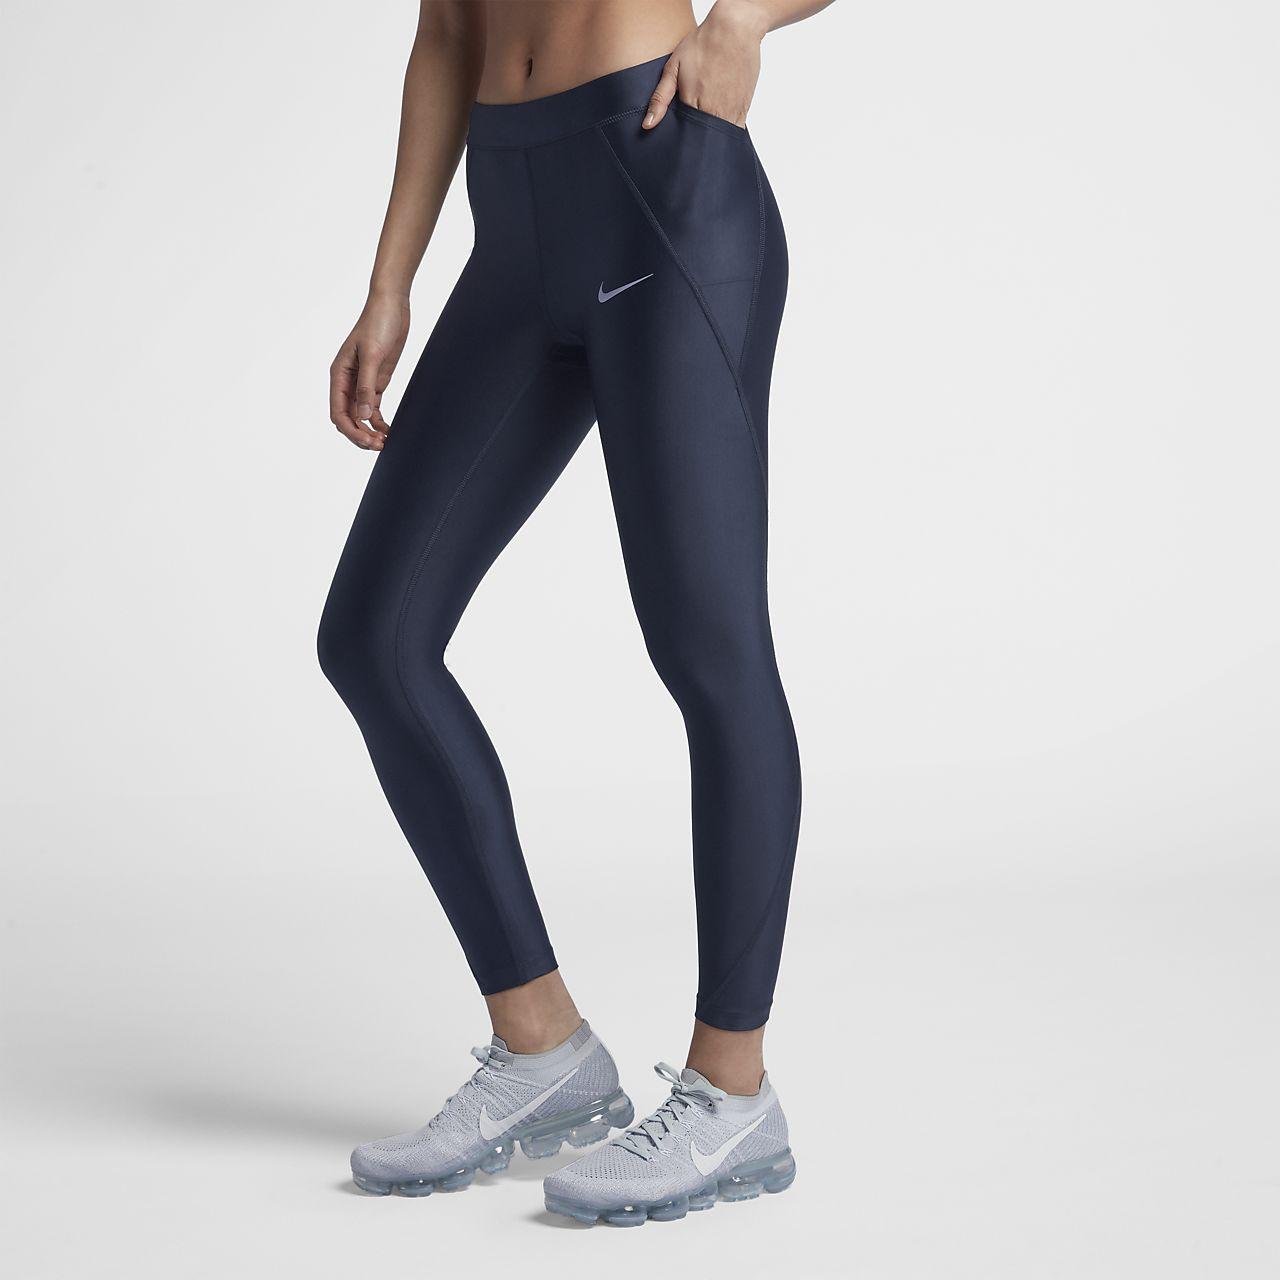 b17527be276 Nike Speed Women s Mid-Rise 7 8 Running Tights. Nike.com